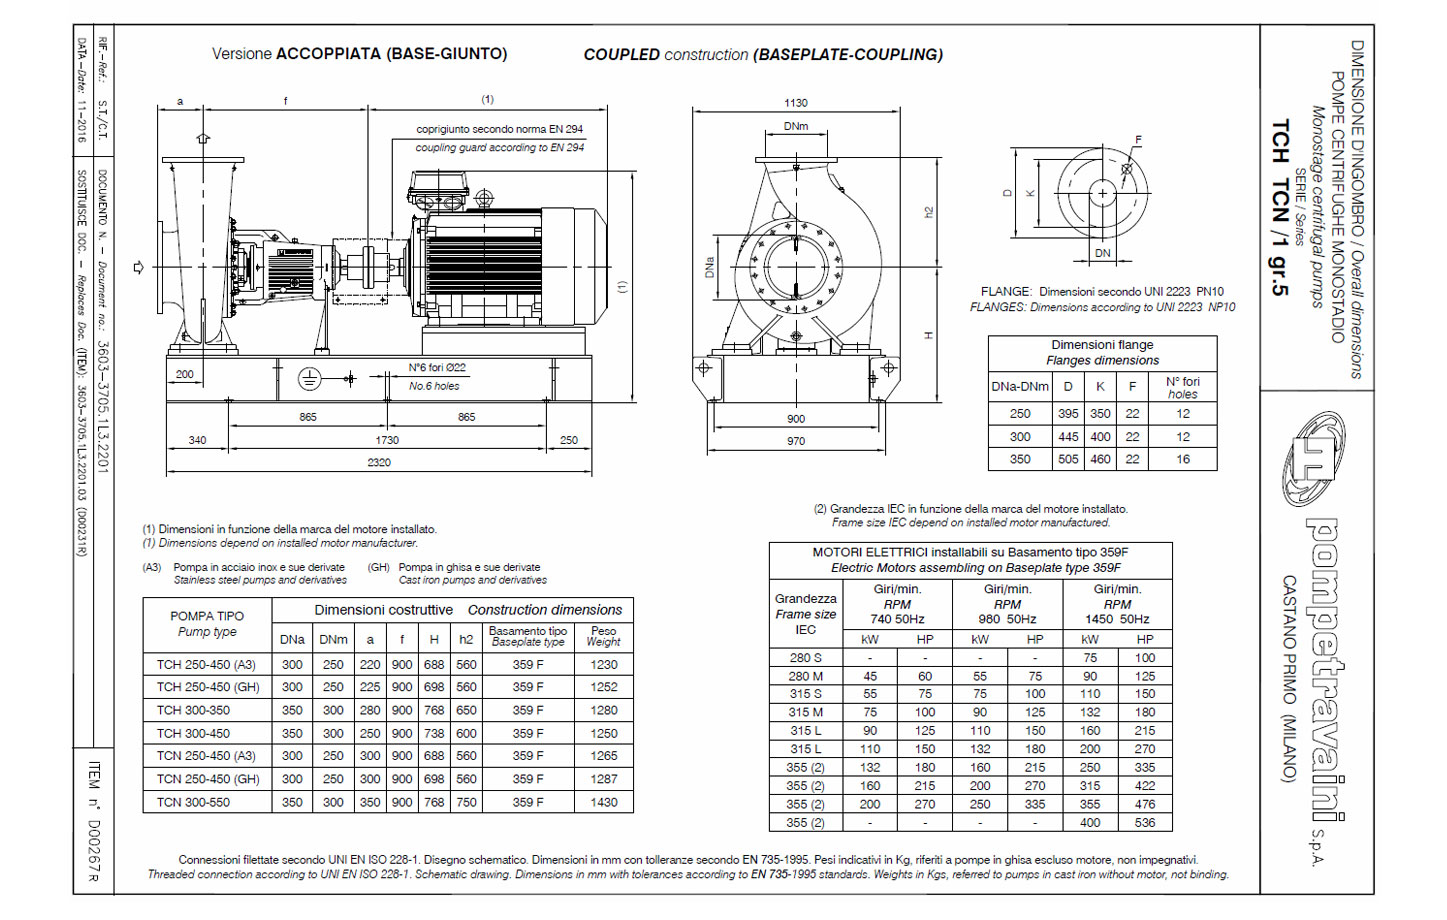 Iec Motor Frame Dimensions